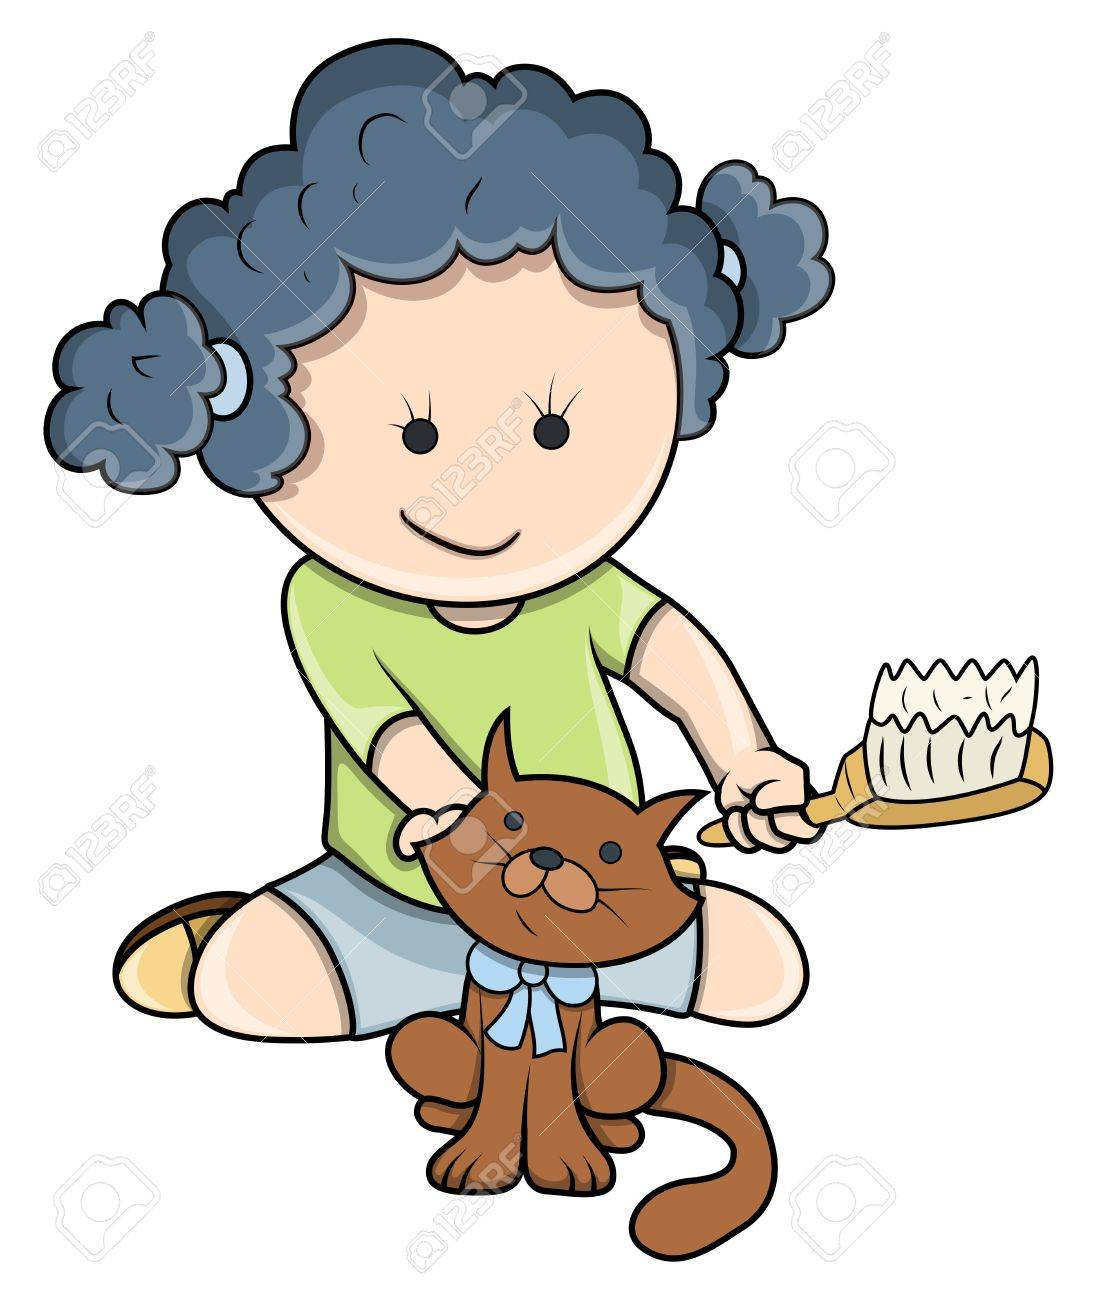 Small Girl Giving Bath To Cat - Vector Cartoon Illustration Stock Vector - 21098233